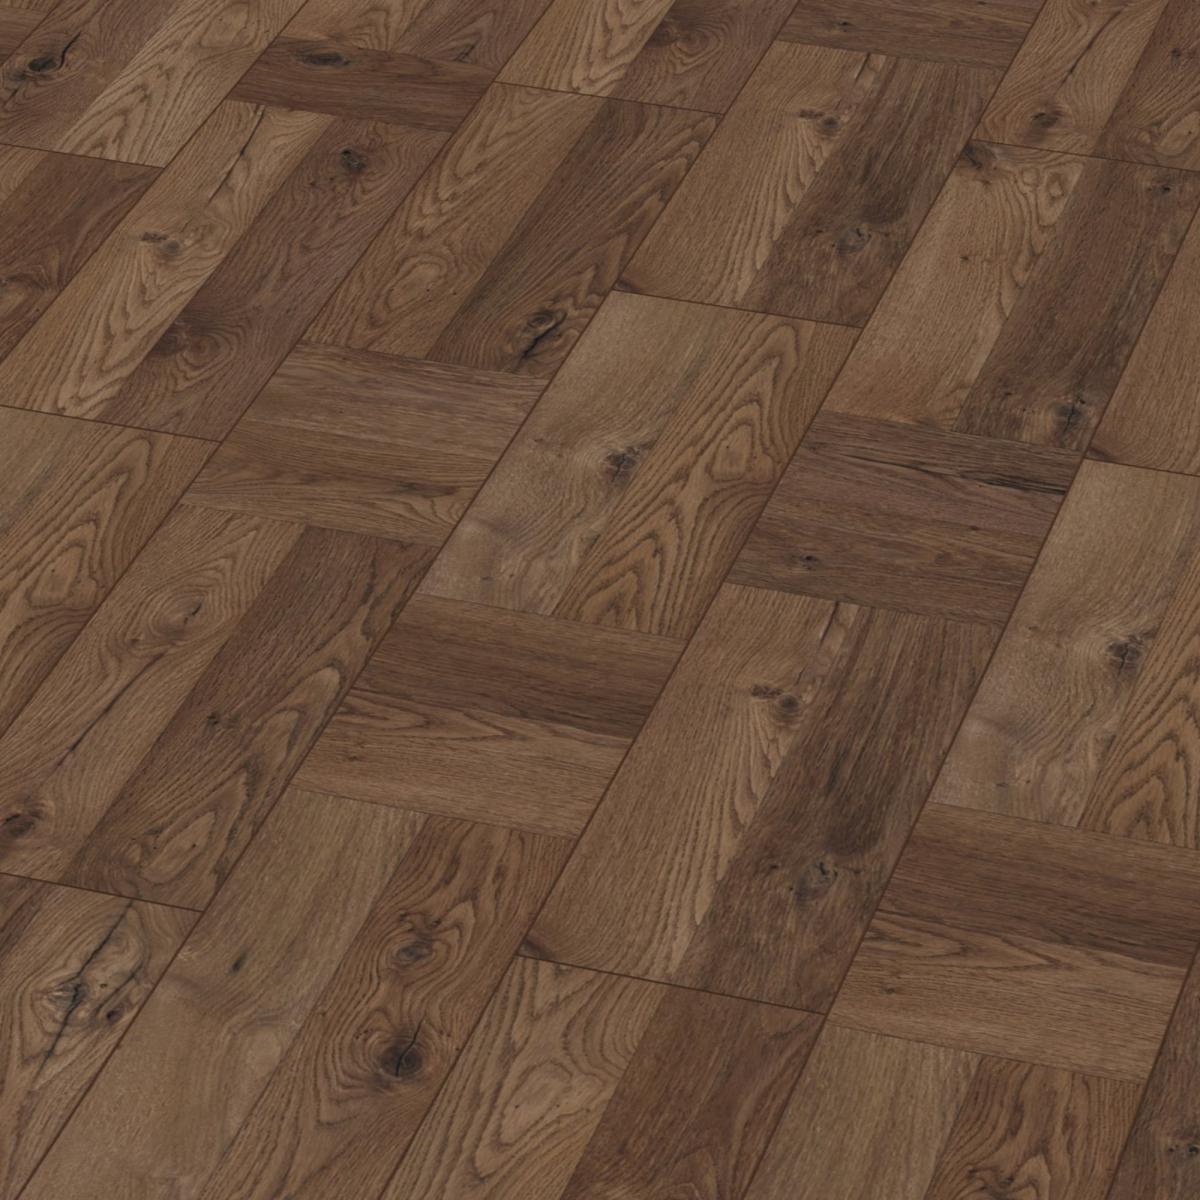 Krono Visby oak grey wide 8mm v groove laminate flooring SAMPLE ...